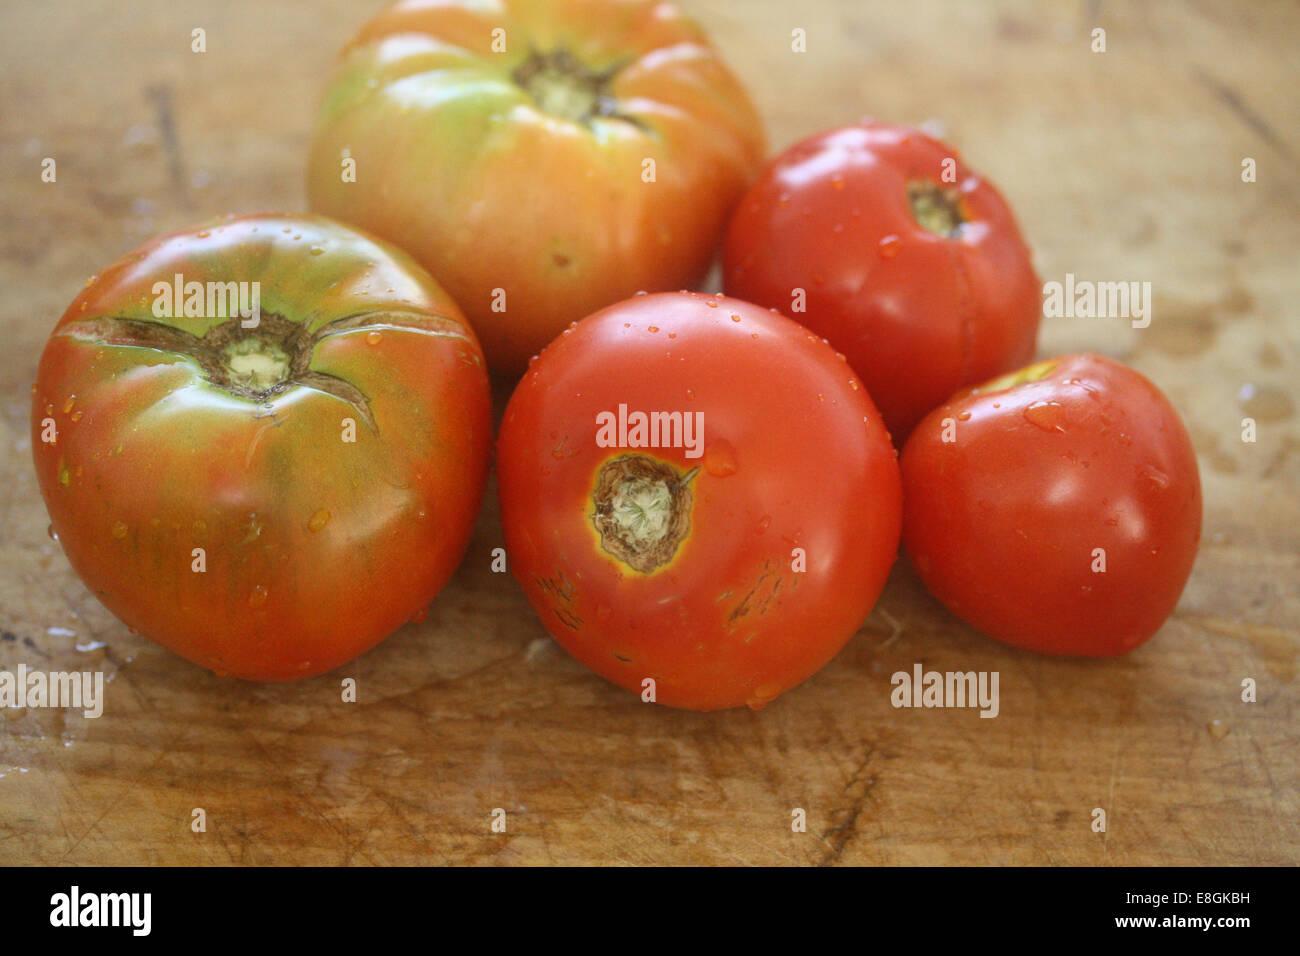 Fünf Heirloom Tomatoes auf Schneidbrett aus Holz Stockbild